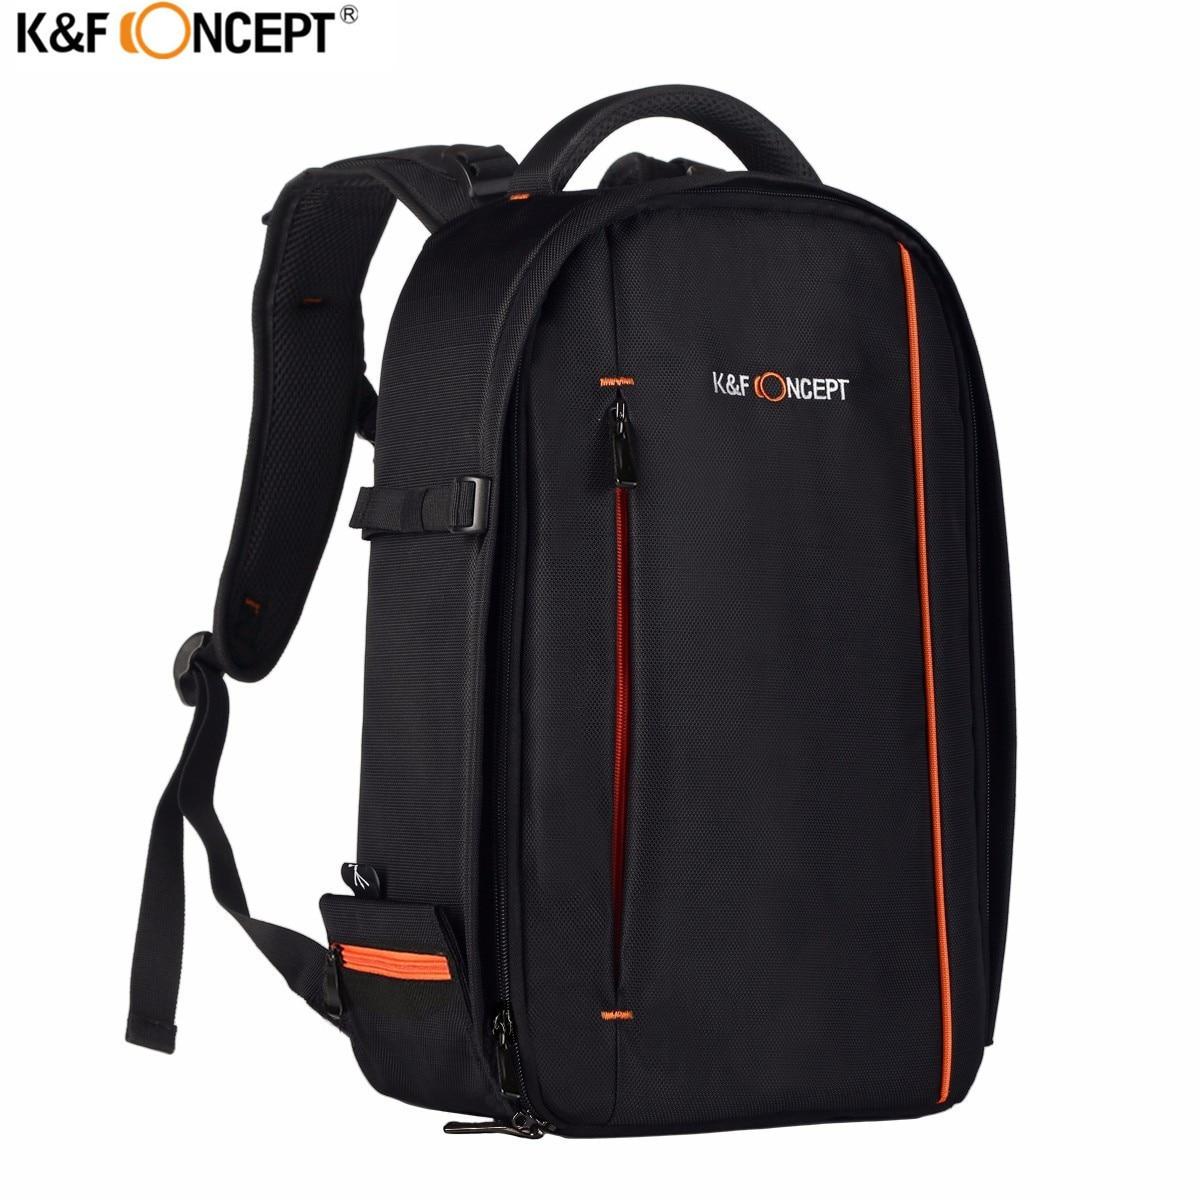 K&F CONCEPT Digital Camera Backpack Bag Multi-functional DSLR Bags Waterproof Shockproof Video SLR Knapsack For Canon Sony Nikon